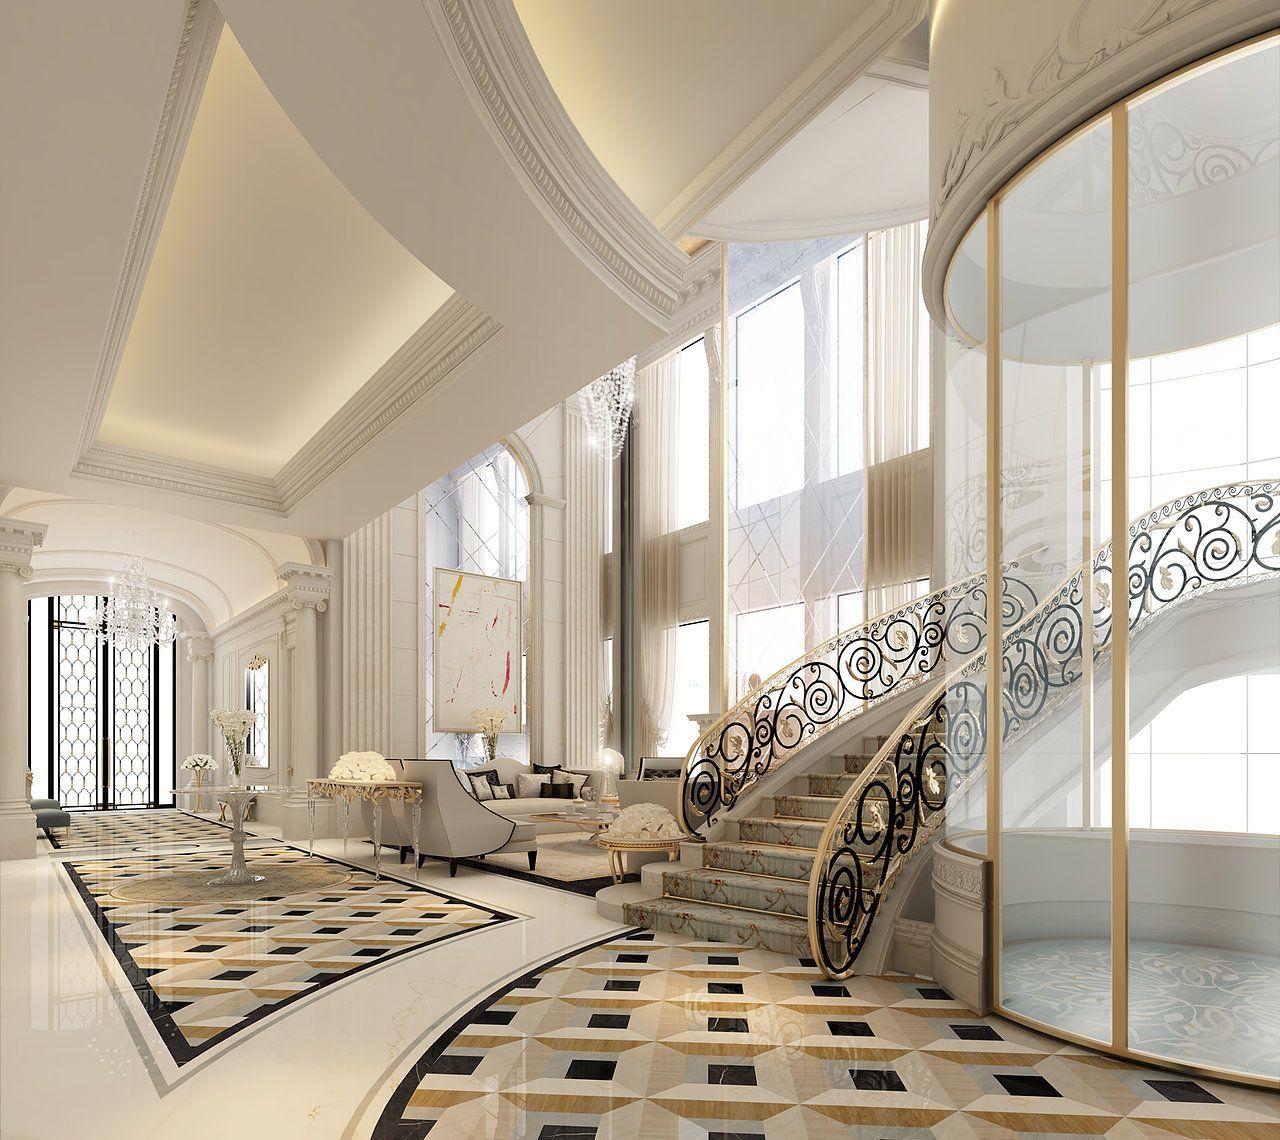 126 Custom Luxury Dining Room Interior Designs: Interior Design Package Includes Majlis Designs, Dining